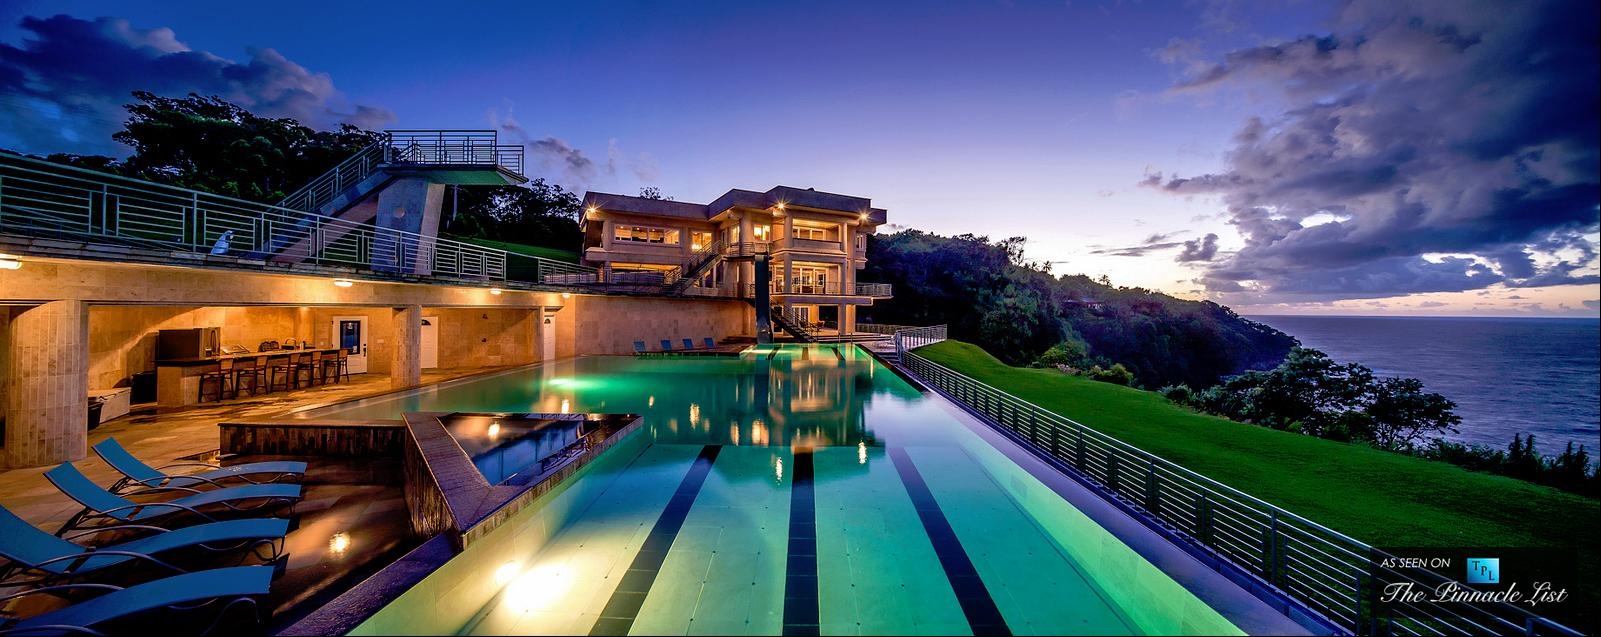 Insane Luxury Home - Water Falling Estate Hawaii